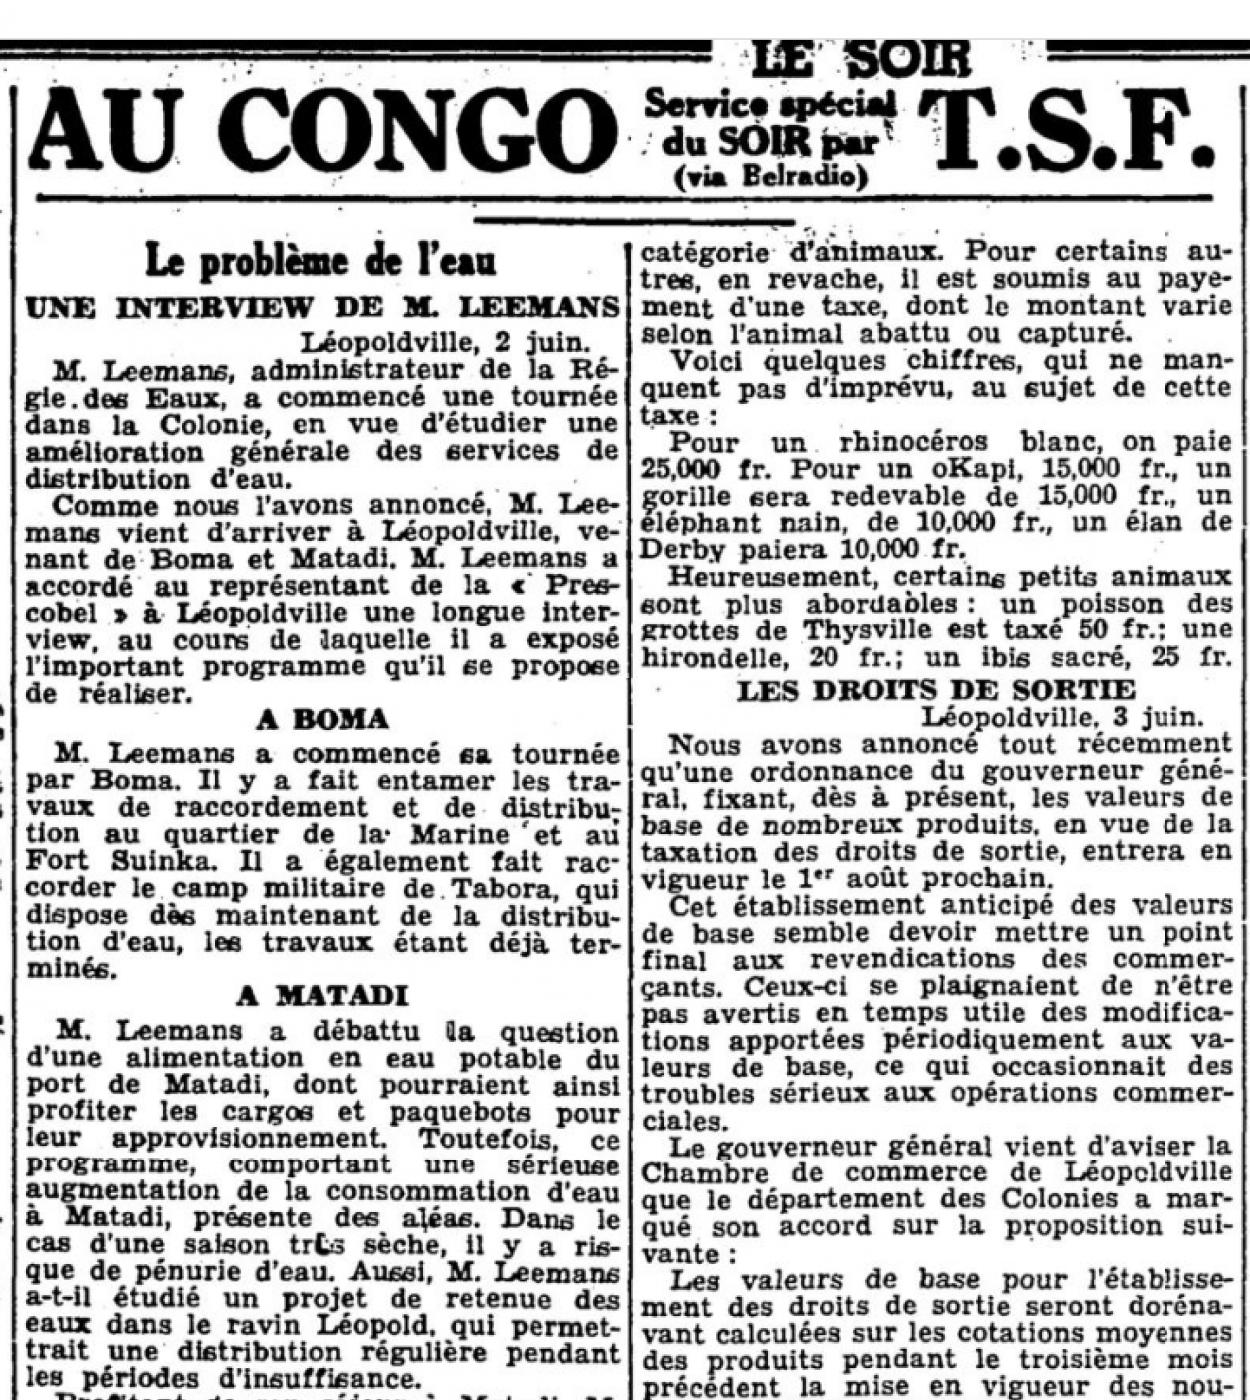 le-soir-4-6-1937-p-5-dAtail.png